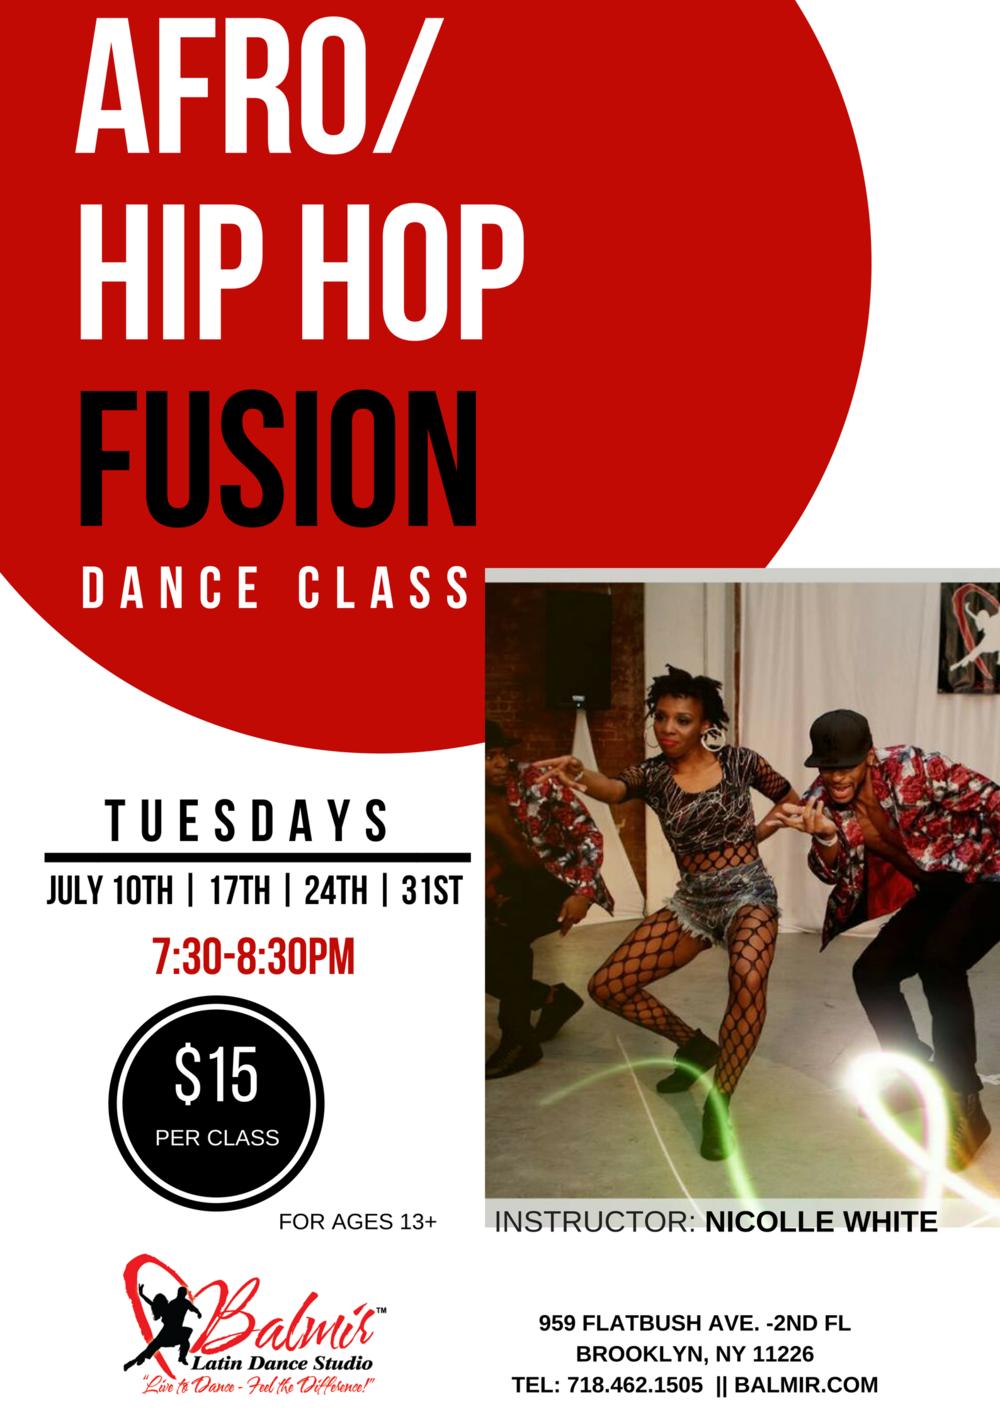 afro hiphop fusion dance class balmir latin dance studio july 2018